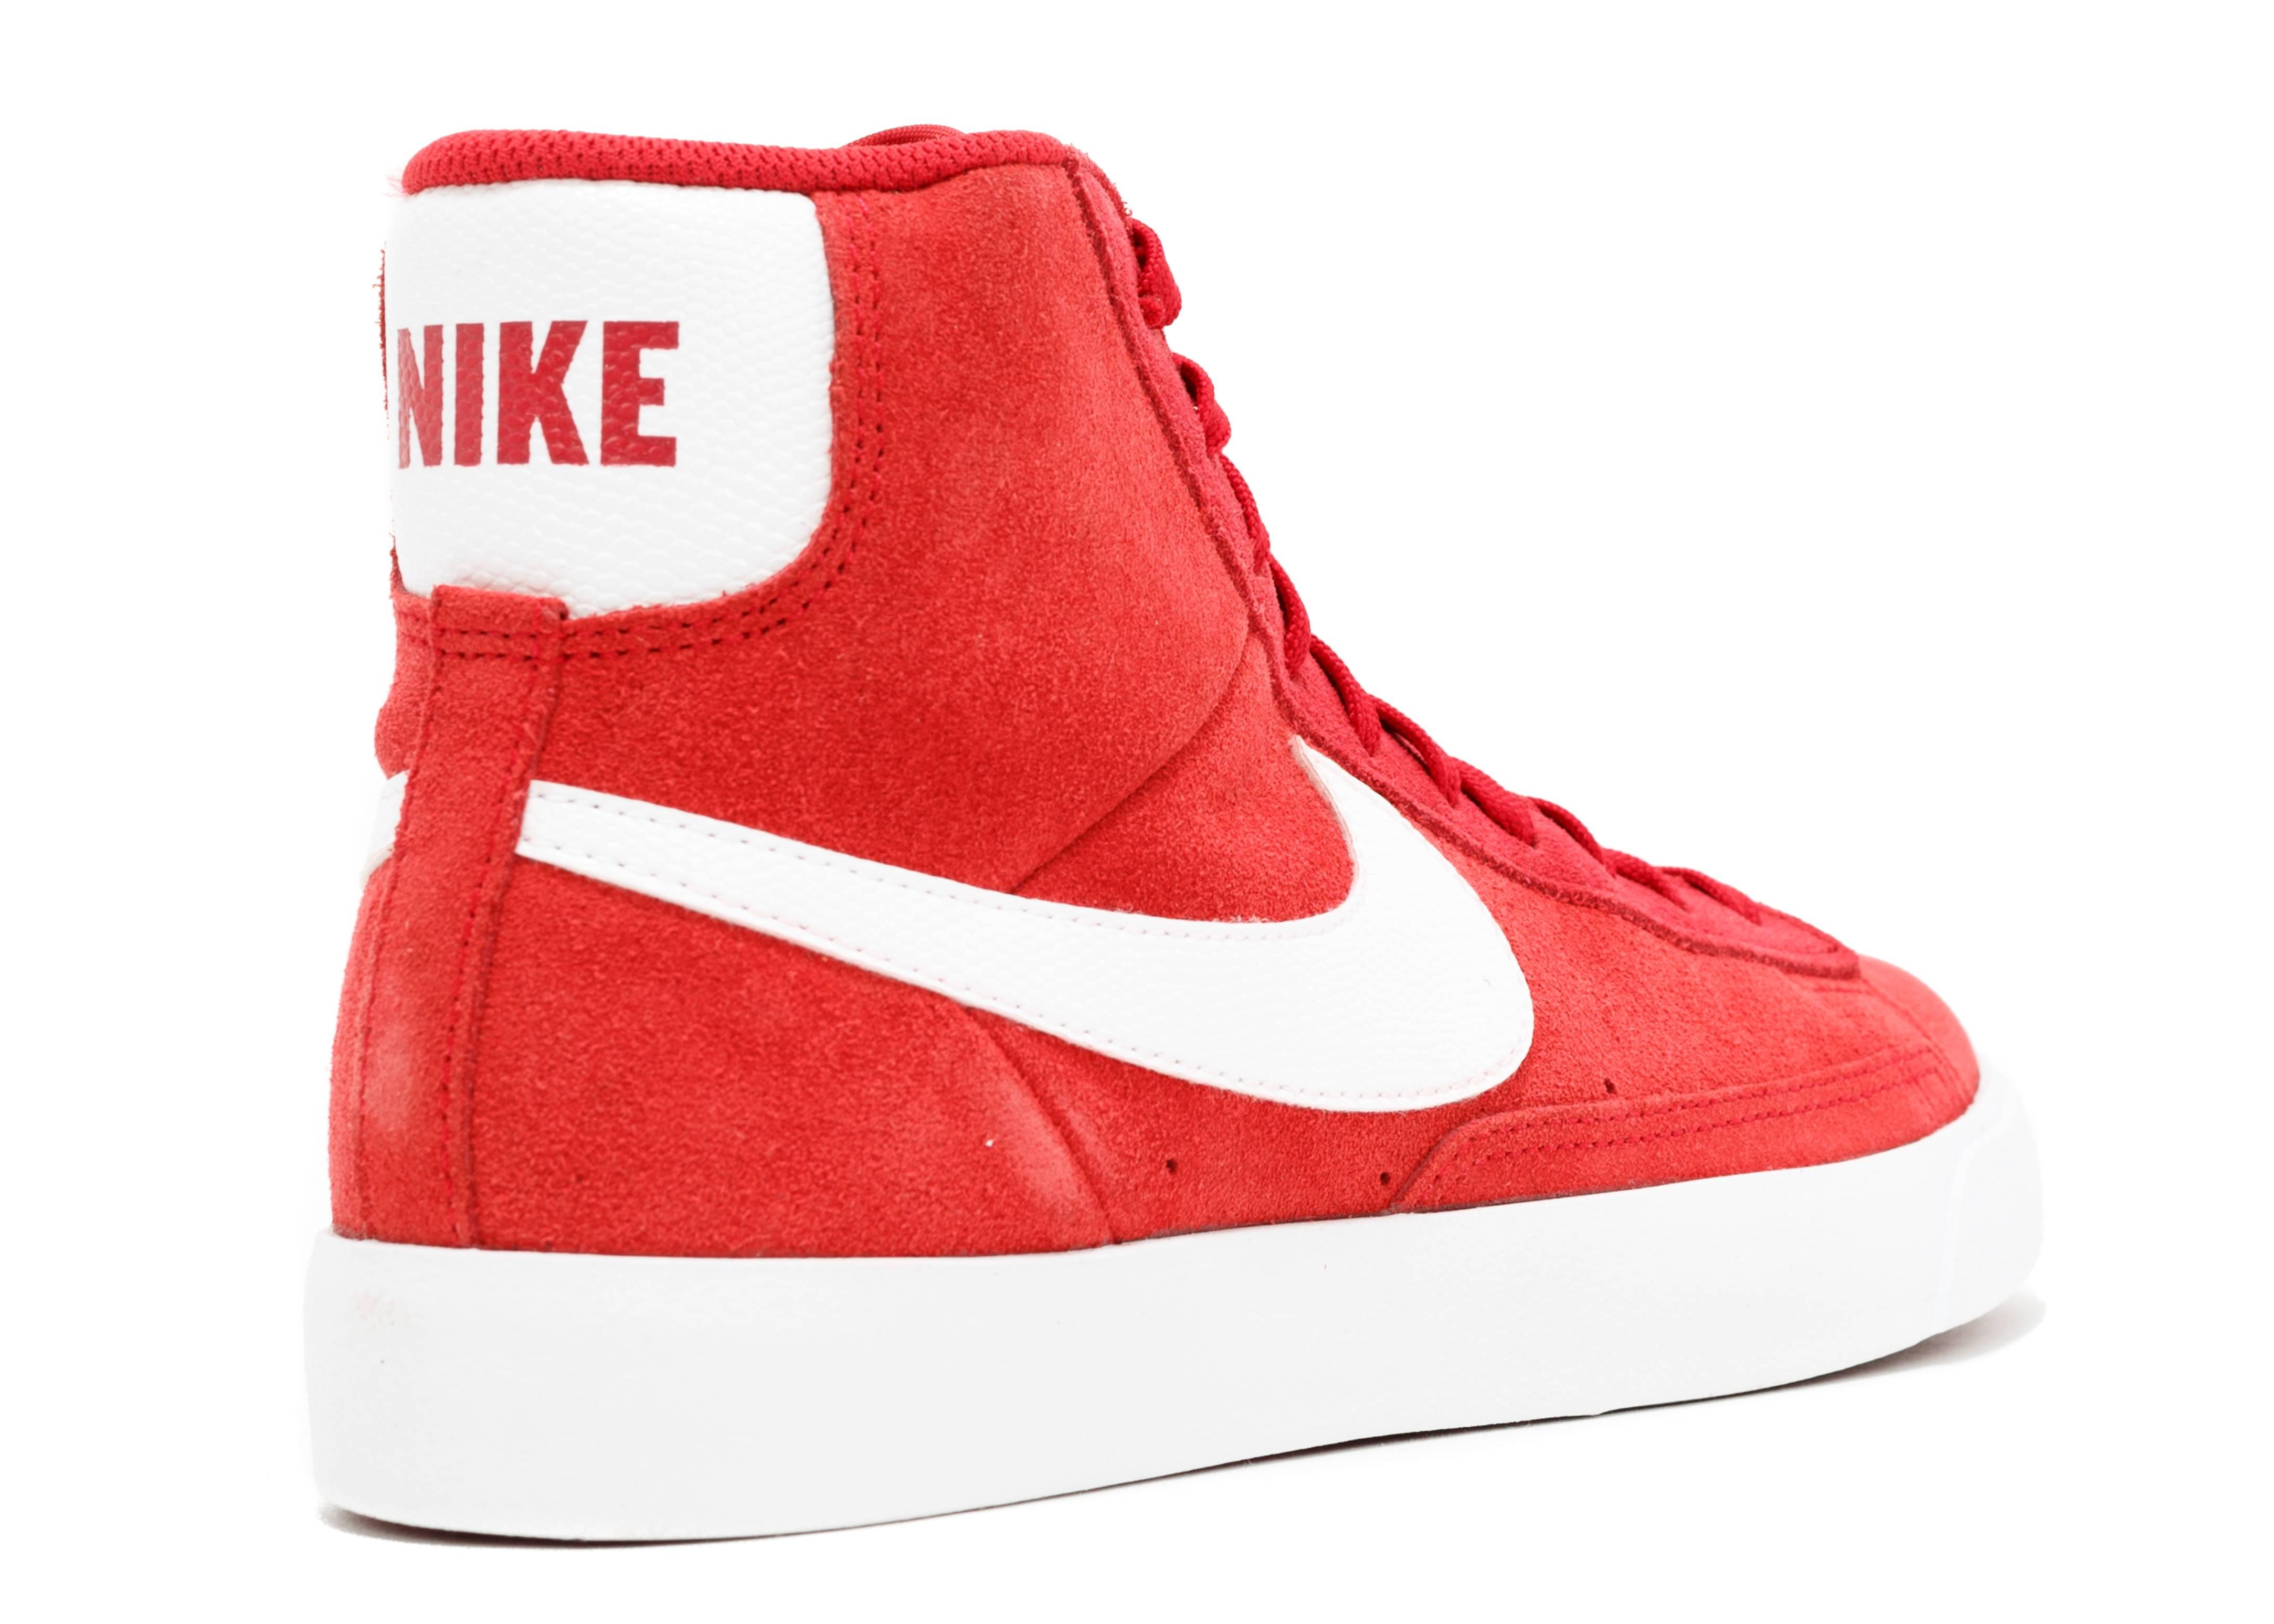 quality design 944c9 7f798 blazer mid gym redwhite-gym red-tm orng